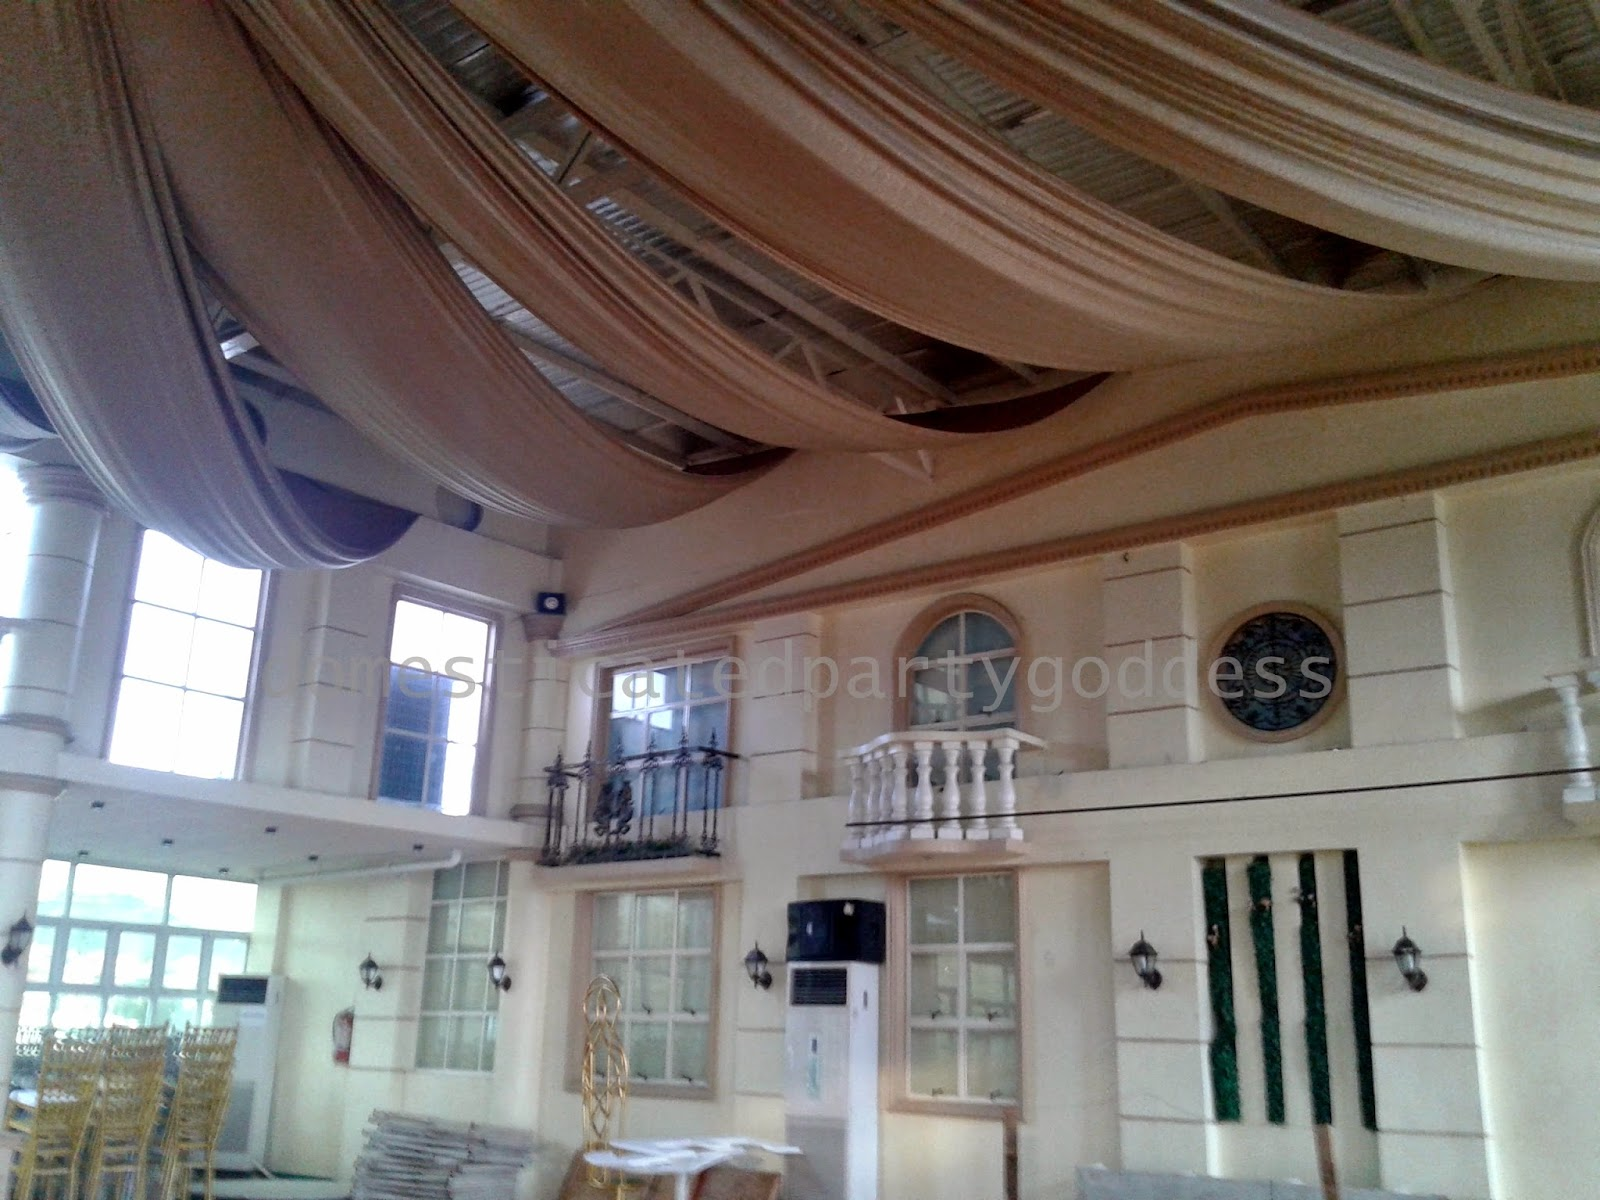 Domesticated party goddess party venue castillo royale for 15th floor octagon building ortigas